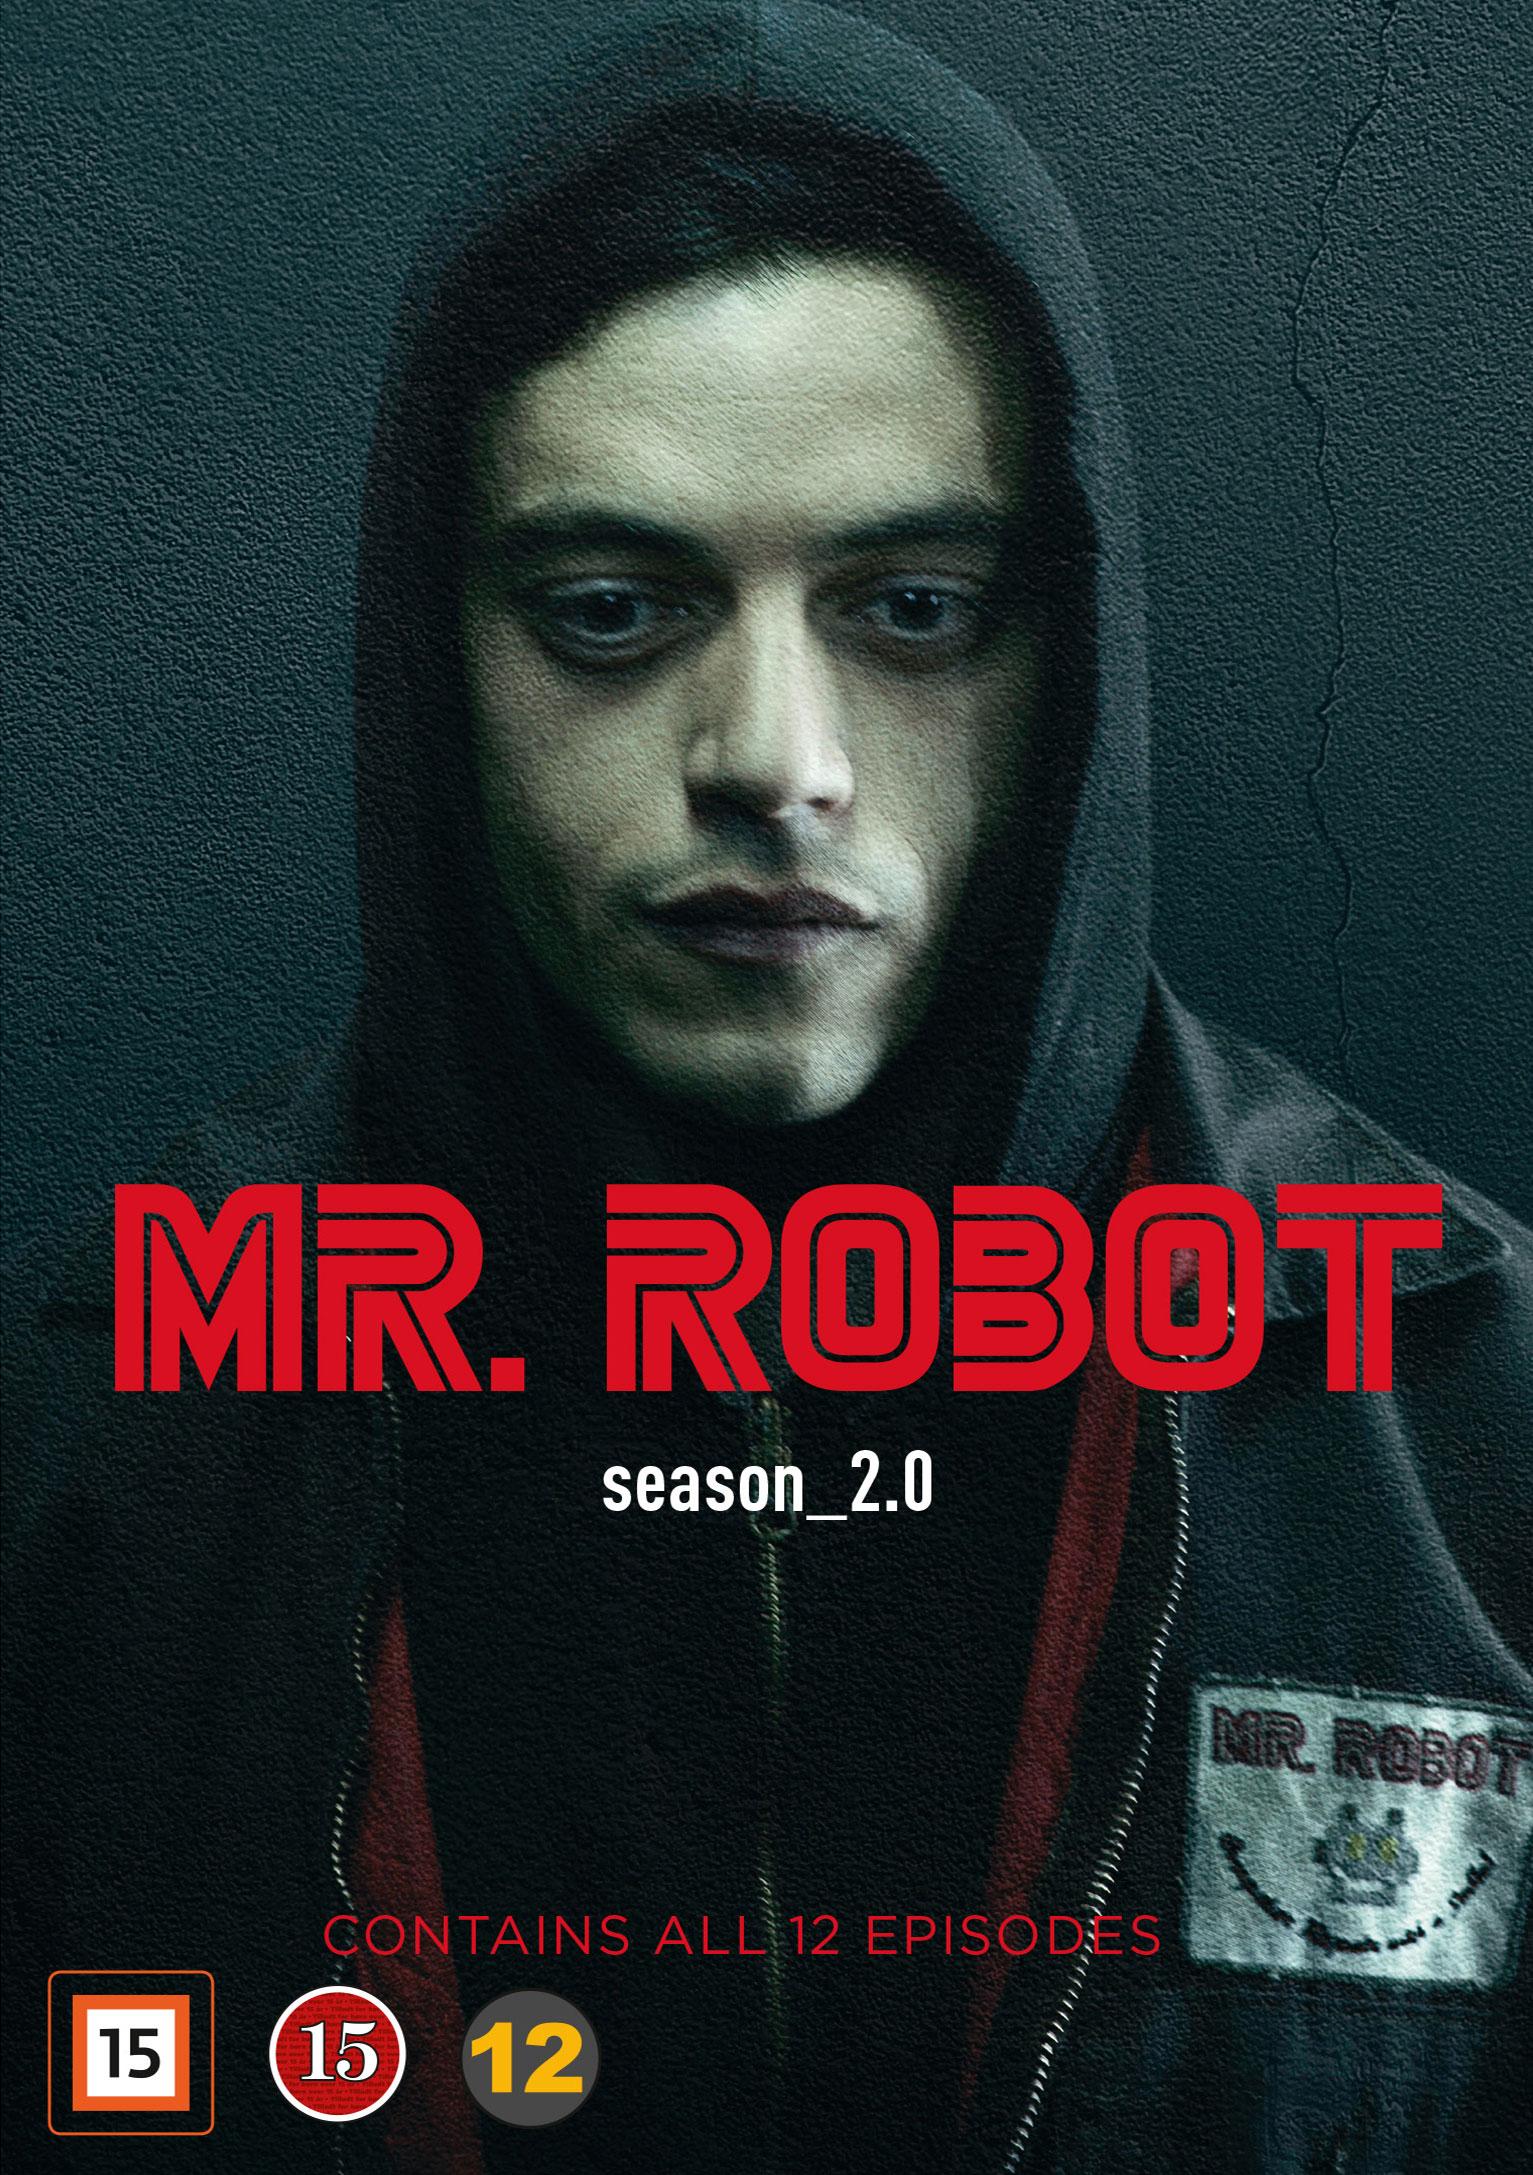 mr robot season 2 cover